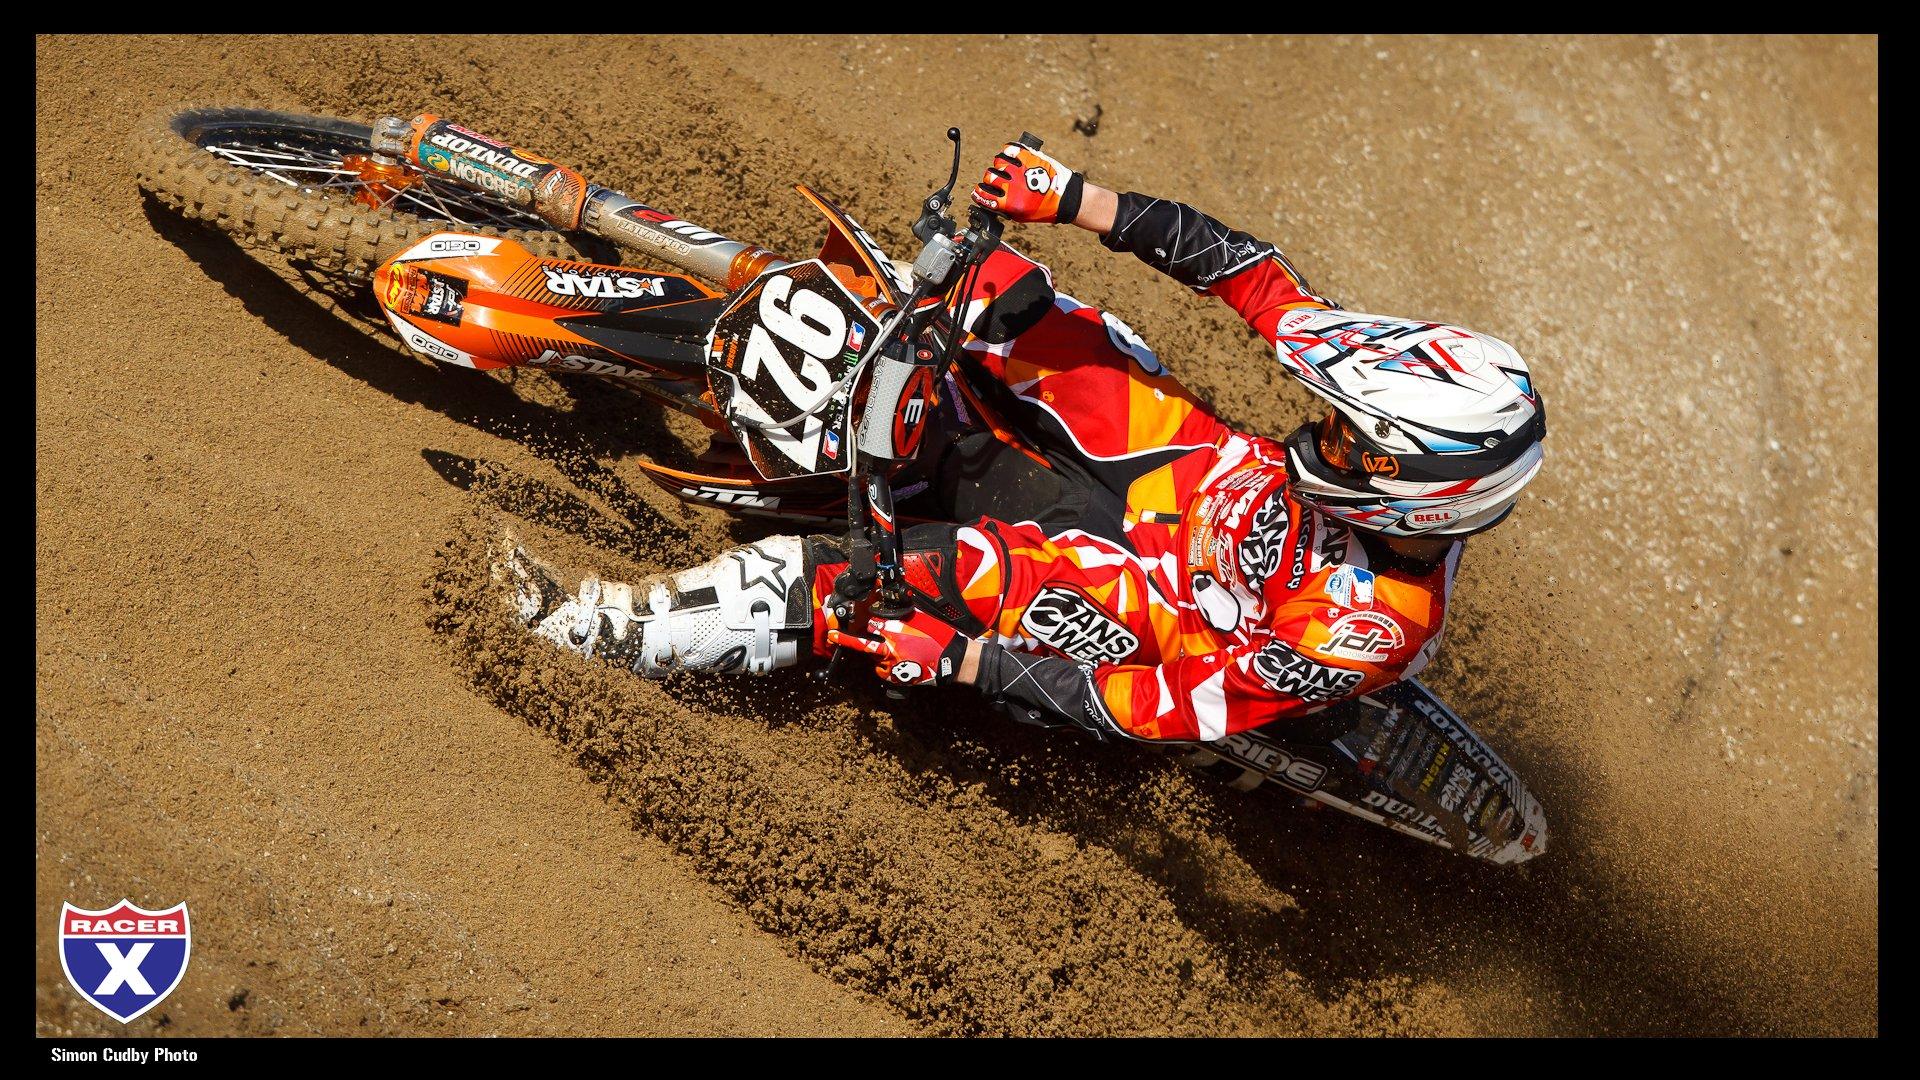 KTM Motocross Offroad Wallpaper HD 817